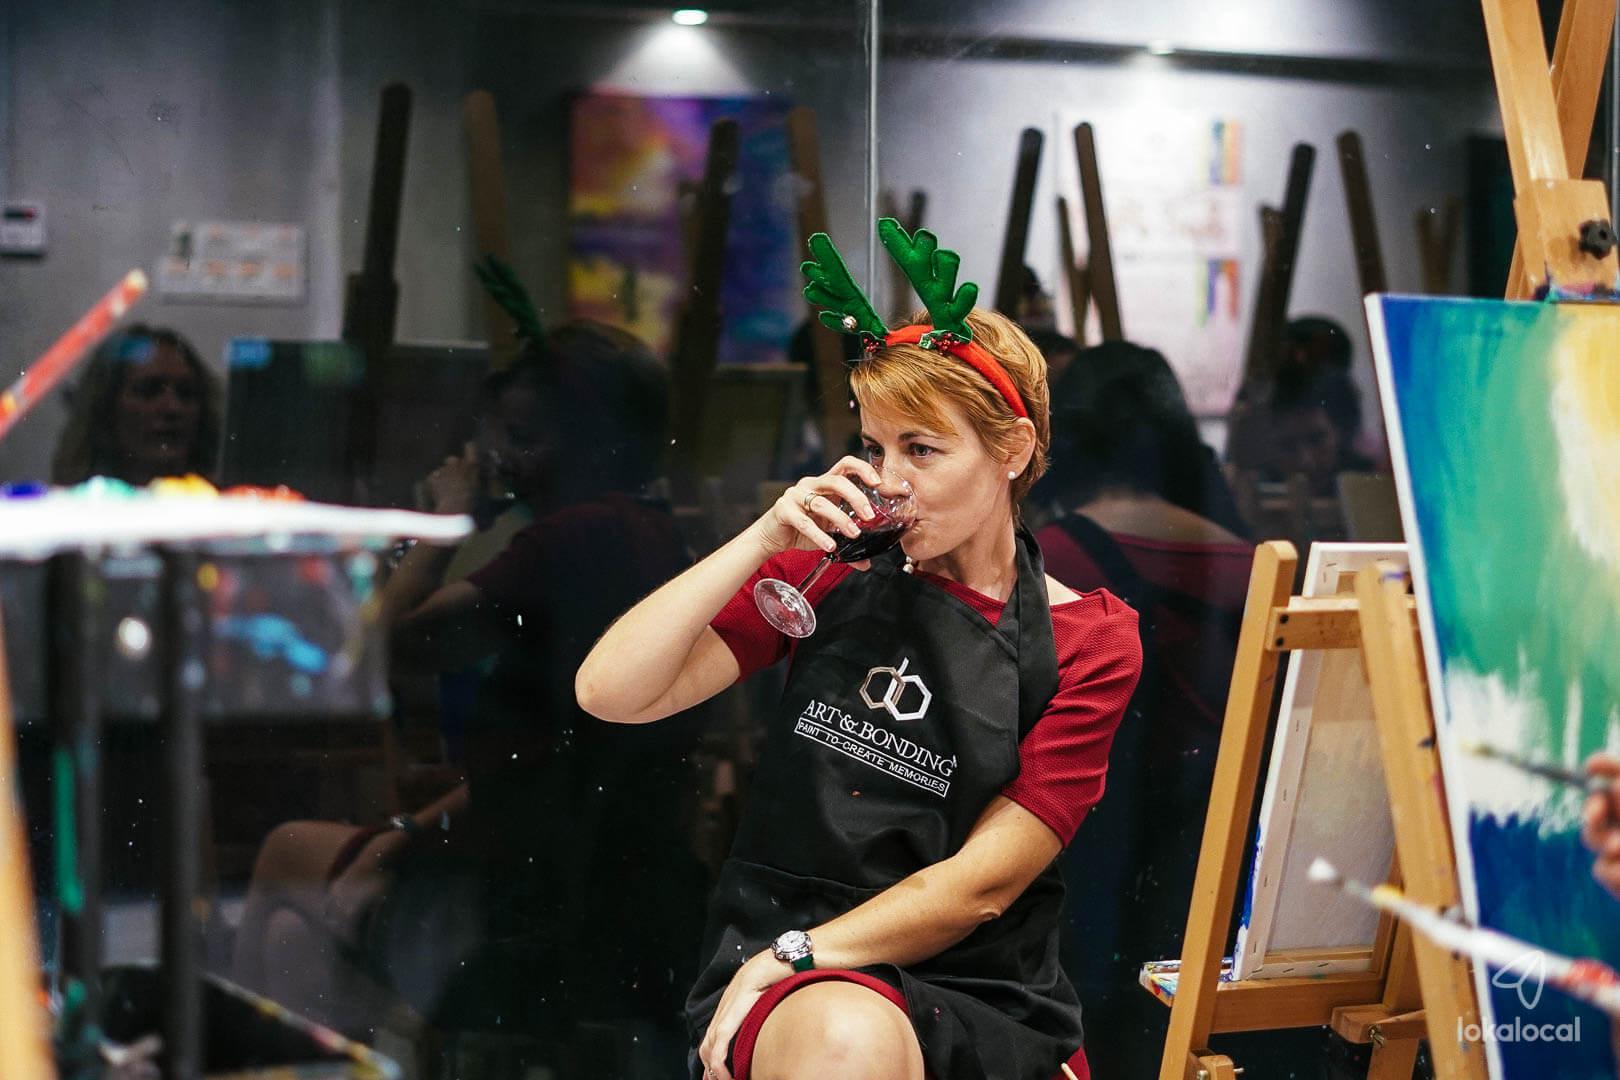 xmas-wine-and-art-bonding-christmas-activity-nightlife-in-kuala-lumpur-sip-and-paint-my-kl